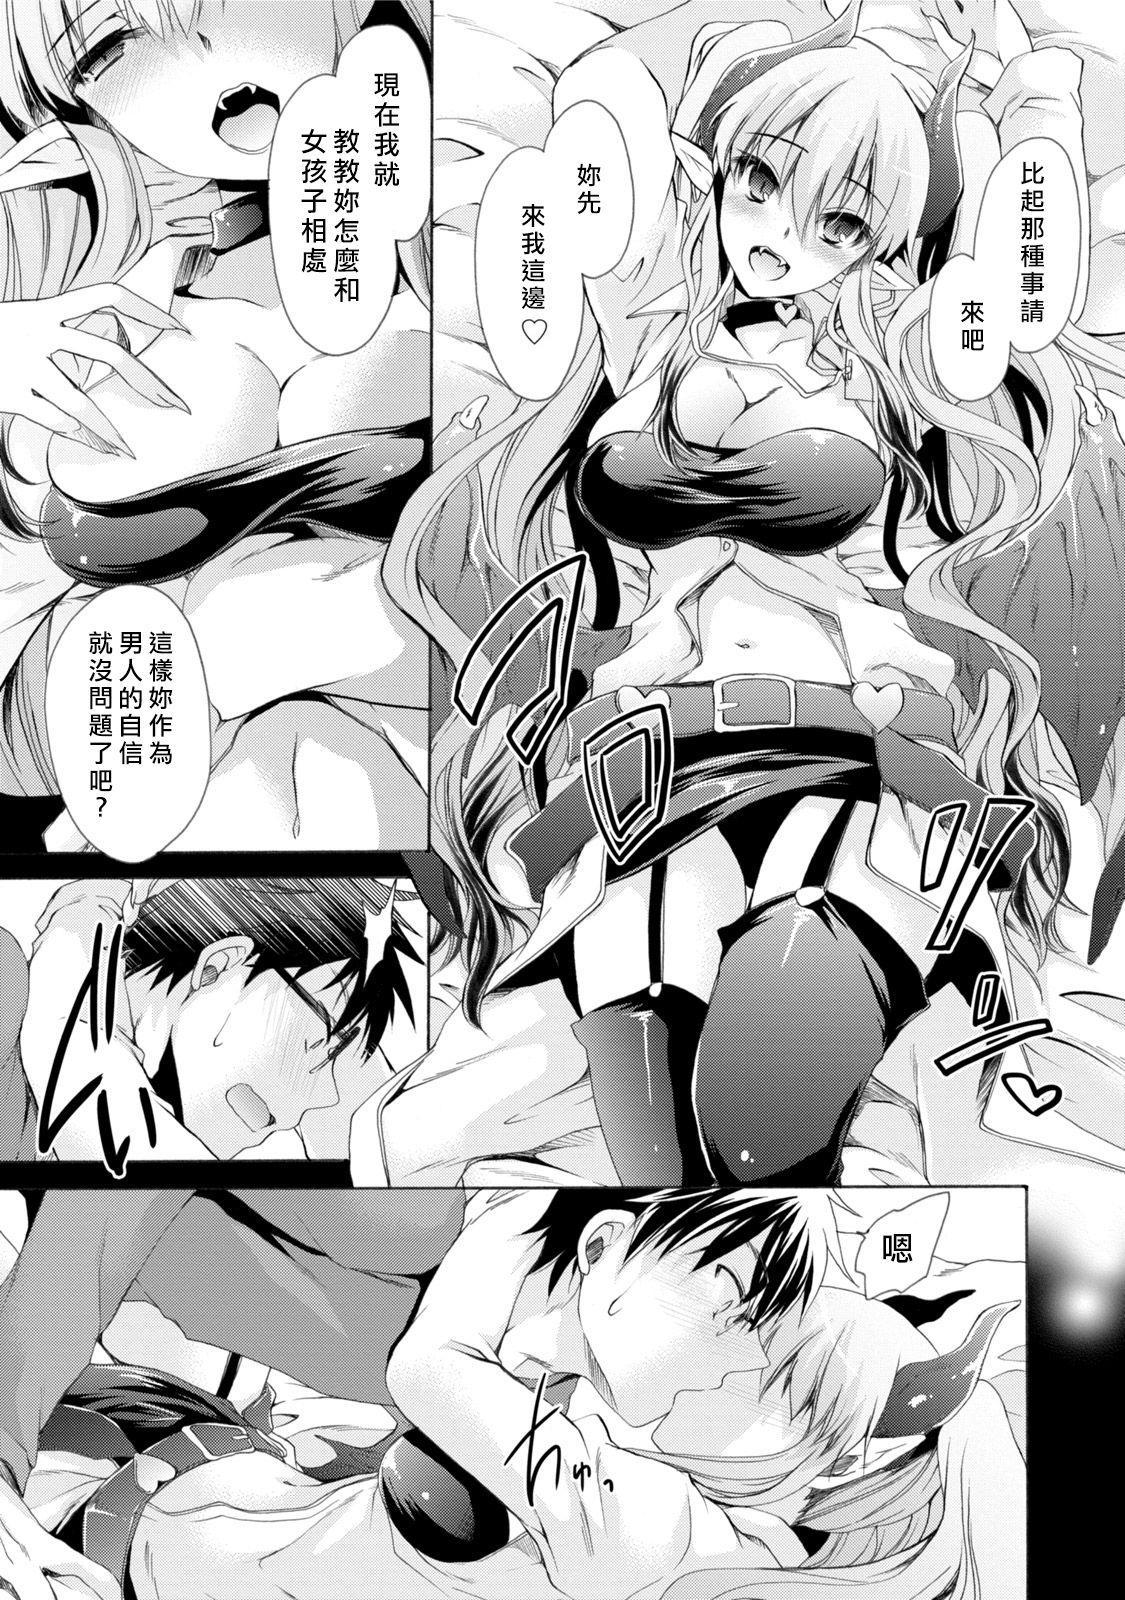 [Shinonome Ryu] Ore to Kanojo to Owaru Sekai - World's end LoveStory ch.1-9 [Chinese] [爱弹幕汉化组] [Digital] 14